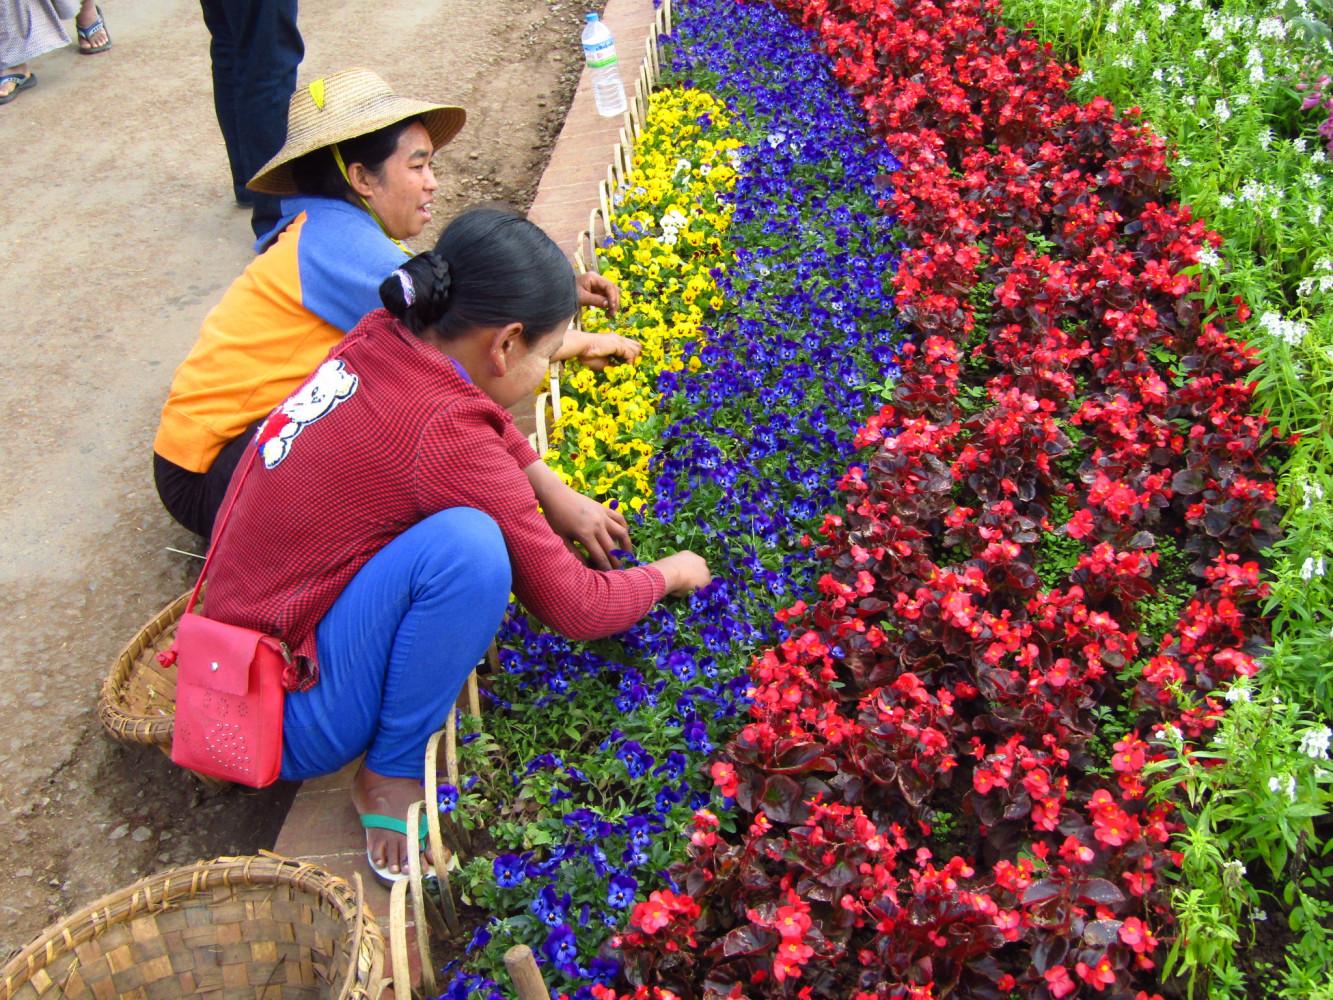 Месяц в Мьянме. Январь 2020. Мандалай - Пин-у-Львин -Сипо - Сагайн -Баган -Ньяунг-Шве(оз.Инле) -Янгон -Чаунг-Та(море) -Баго-Хра-ан